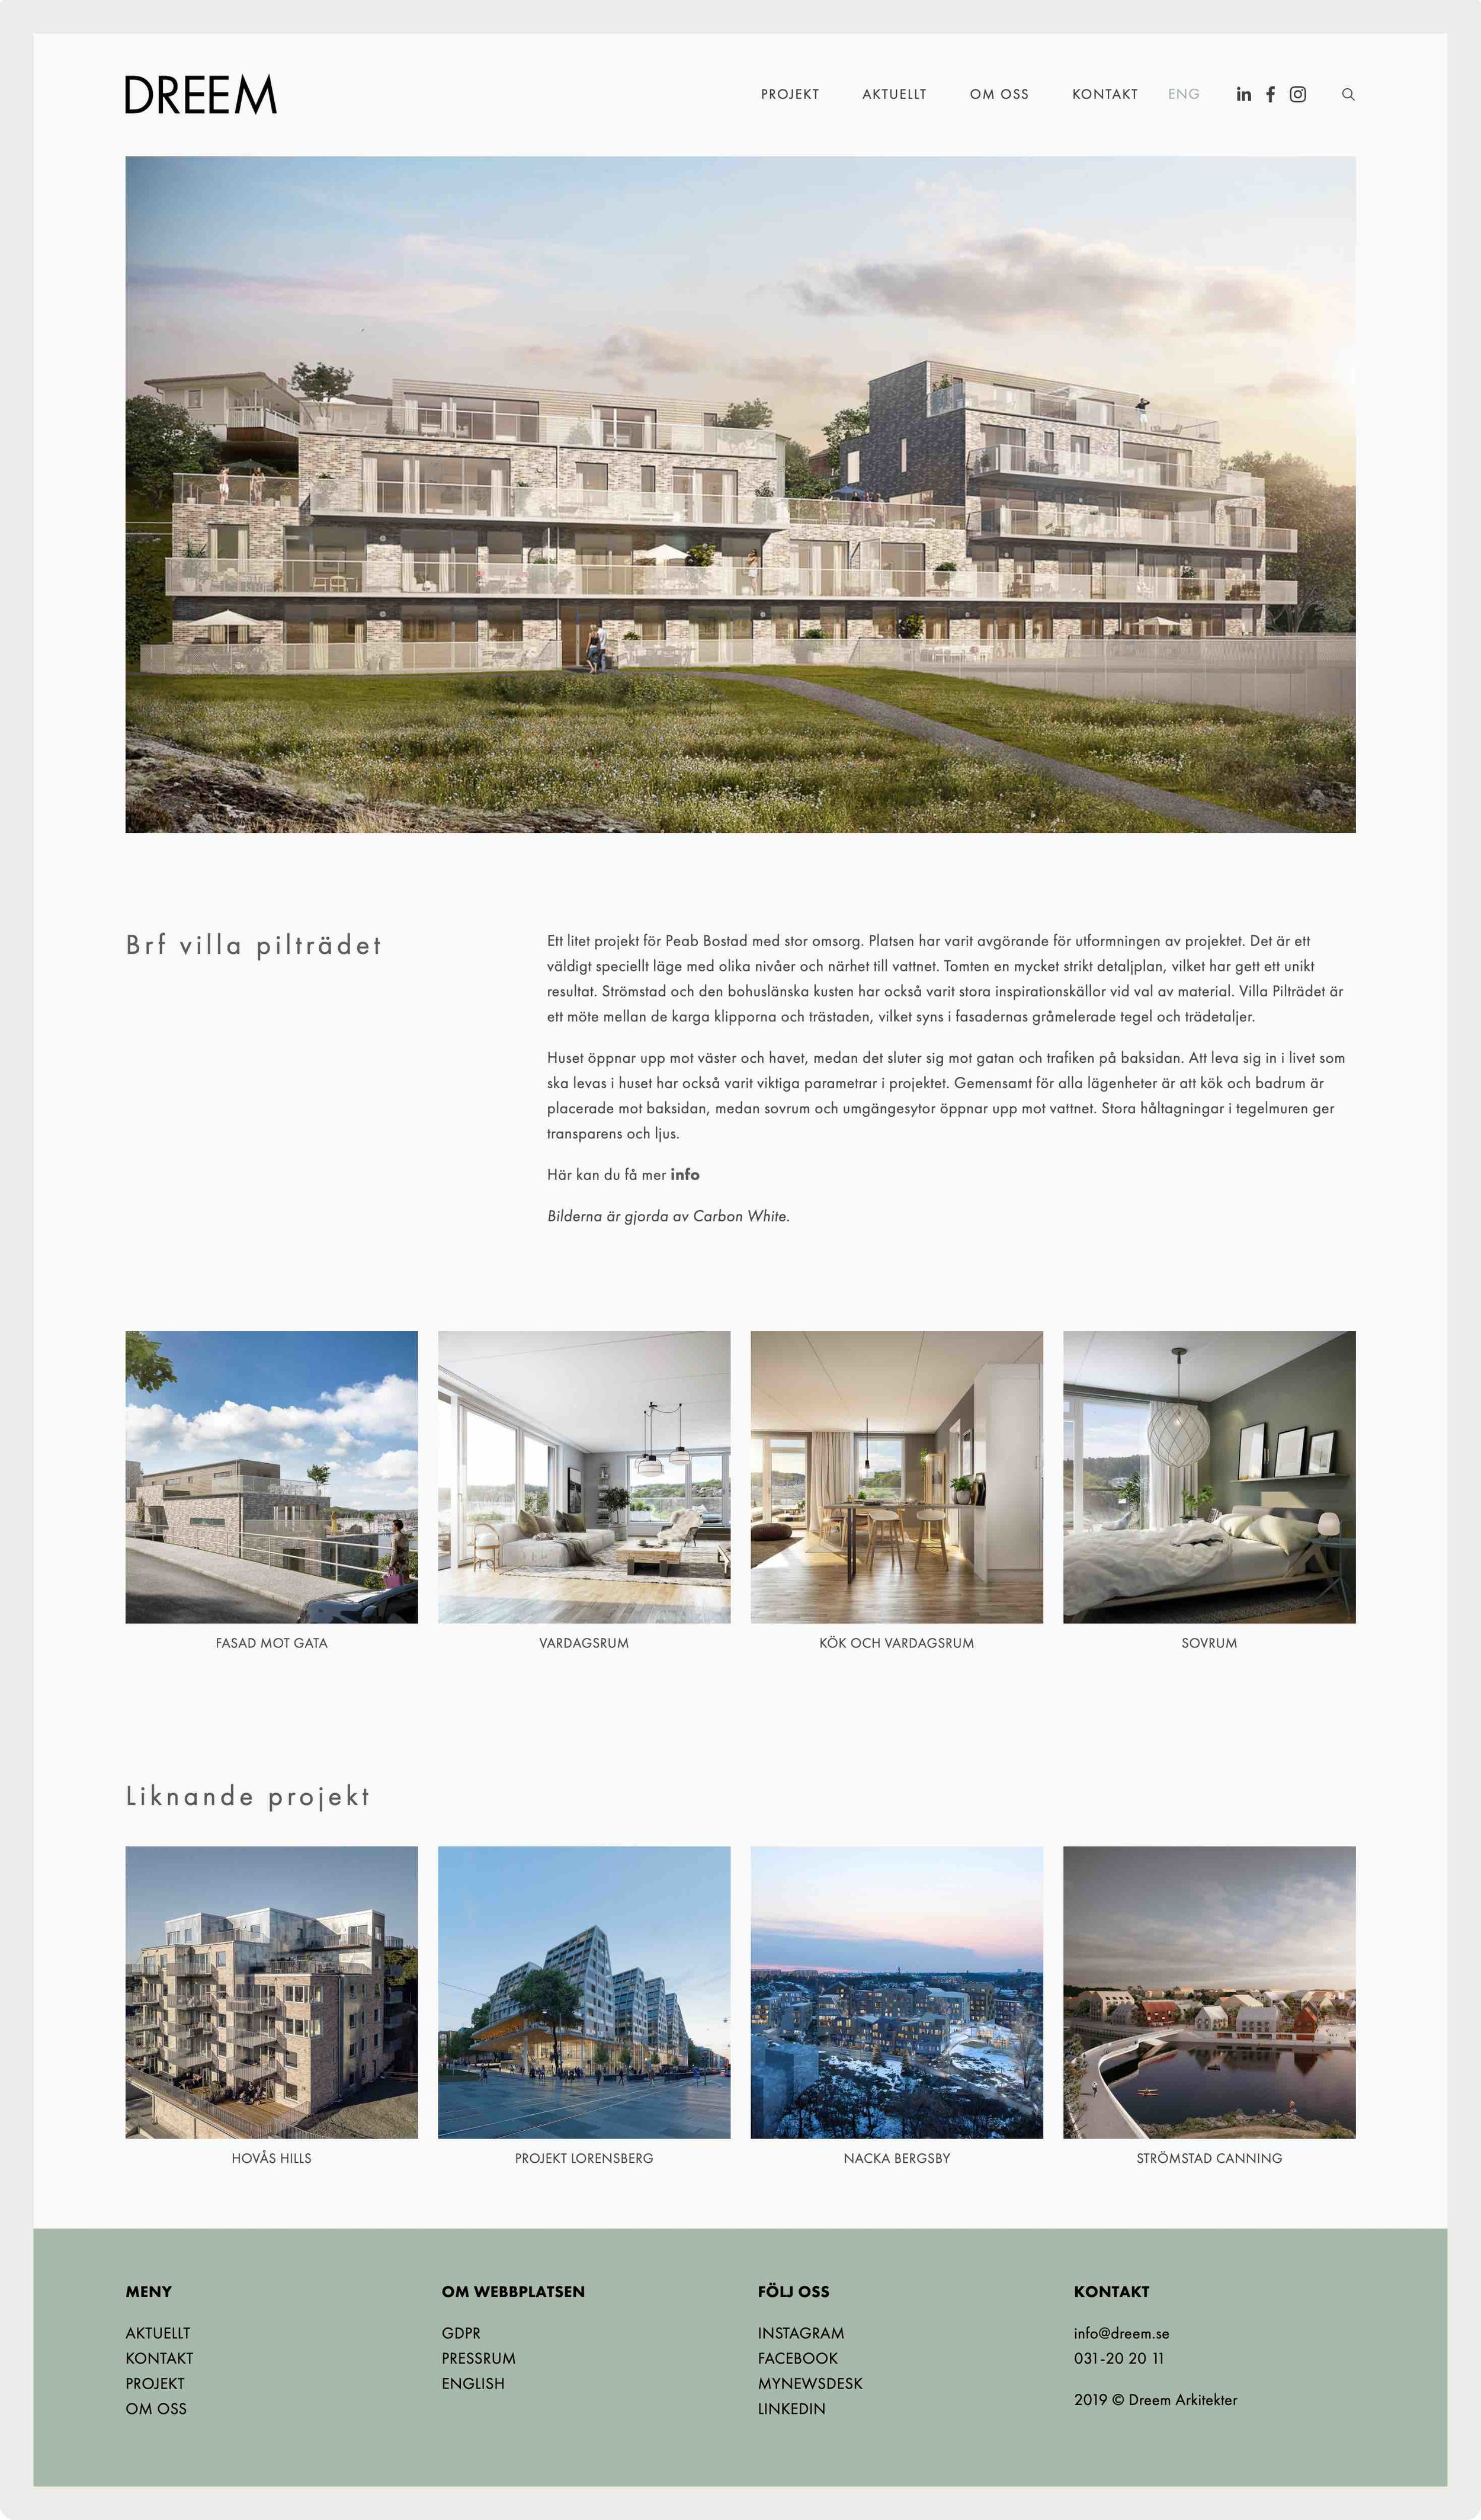 framtidens-webbyrå-uppdrag-dreem-arkitektur-projekt.jpg